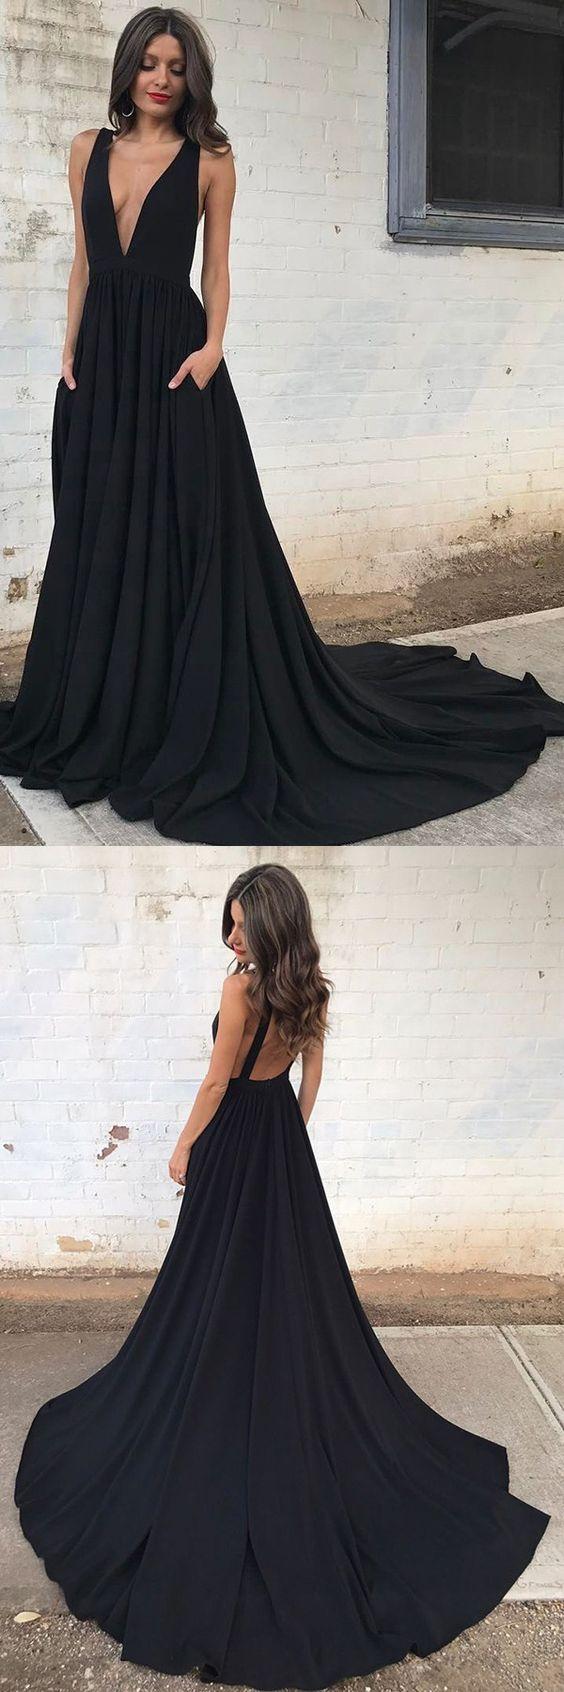 Hem Evening Dresses Sweep/brush Evening Dresses Sheer Back Evening Dresses Gown Evening Dresses